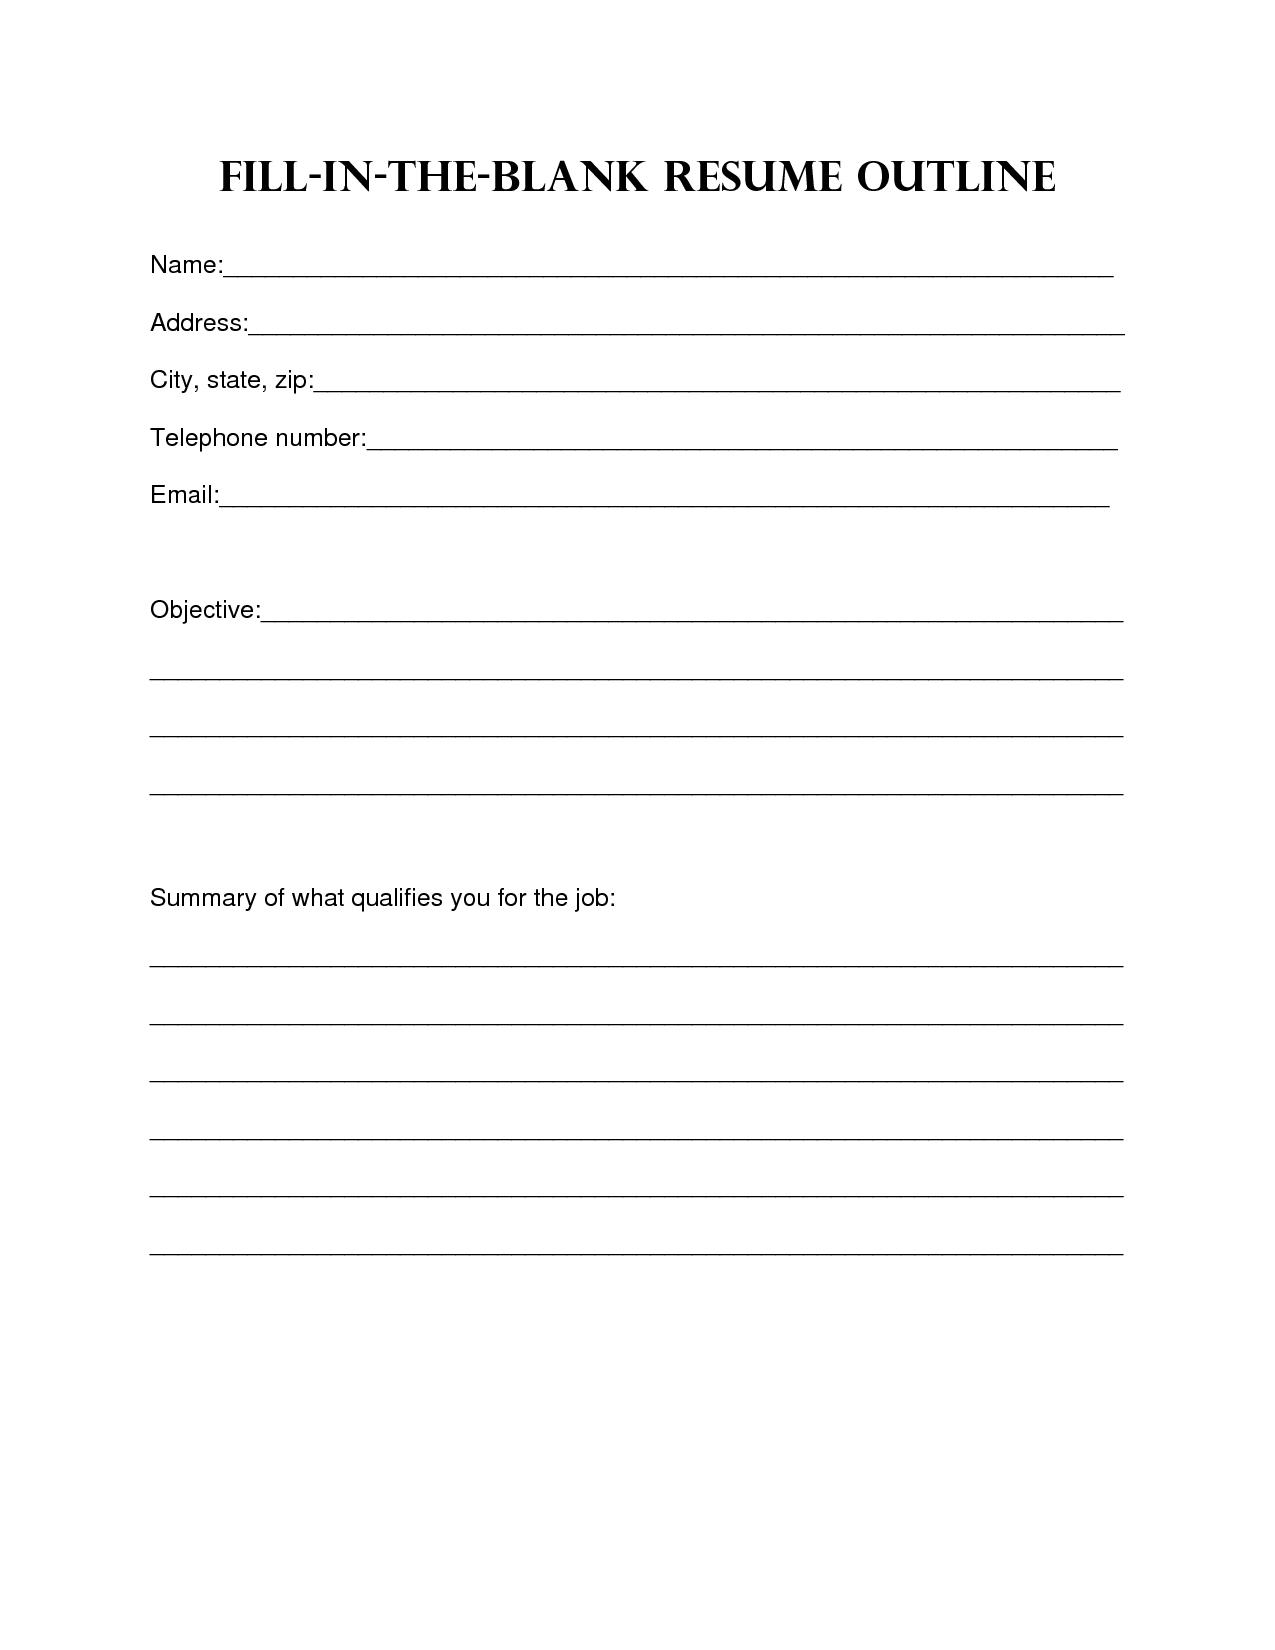 Free Printable Resume Templates Best Template Hdresume Templates With Free Bio Template Fill In Blank